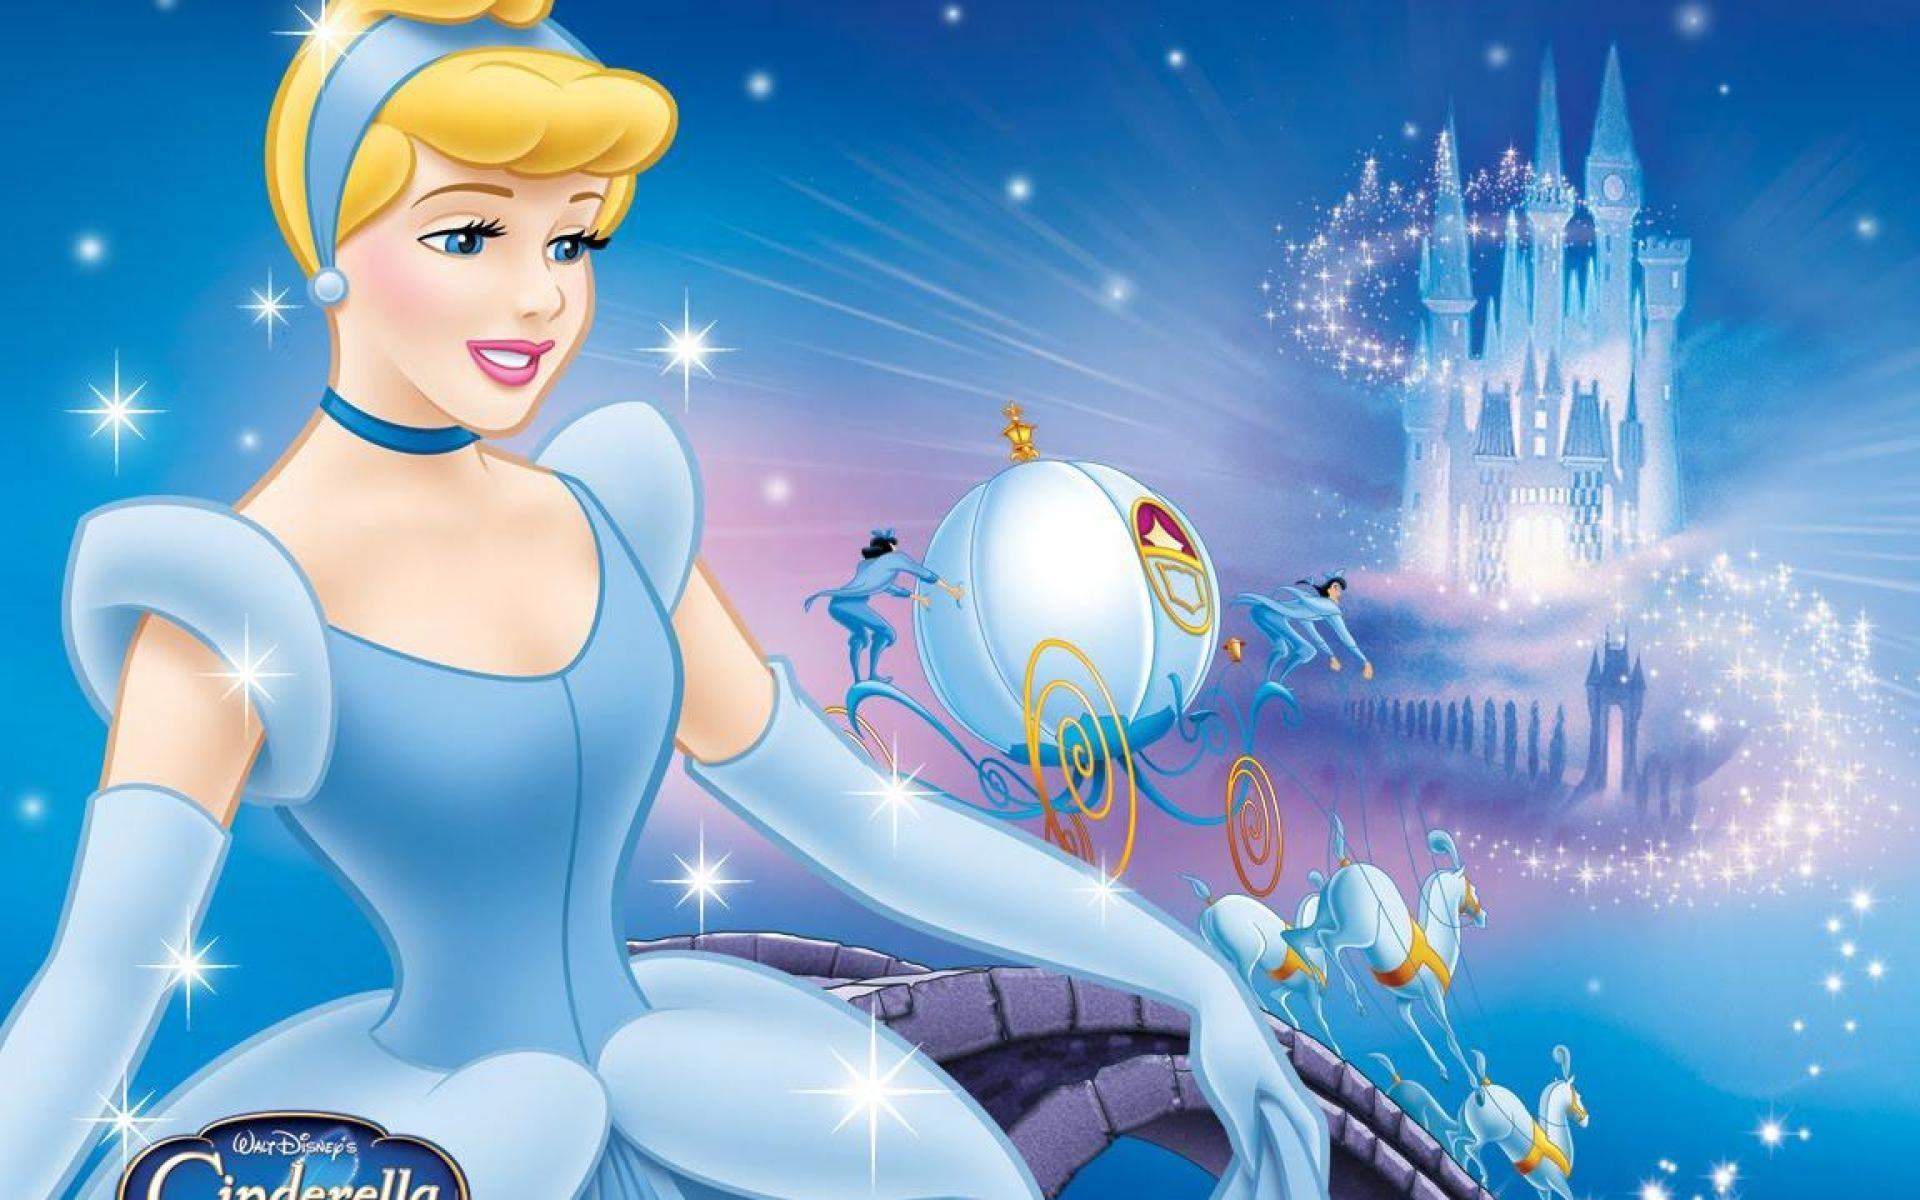 princess wallpaper hd desktop disney pictures Black and white Disney  Princess Wallpapers Wallpapers)